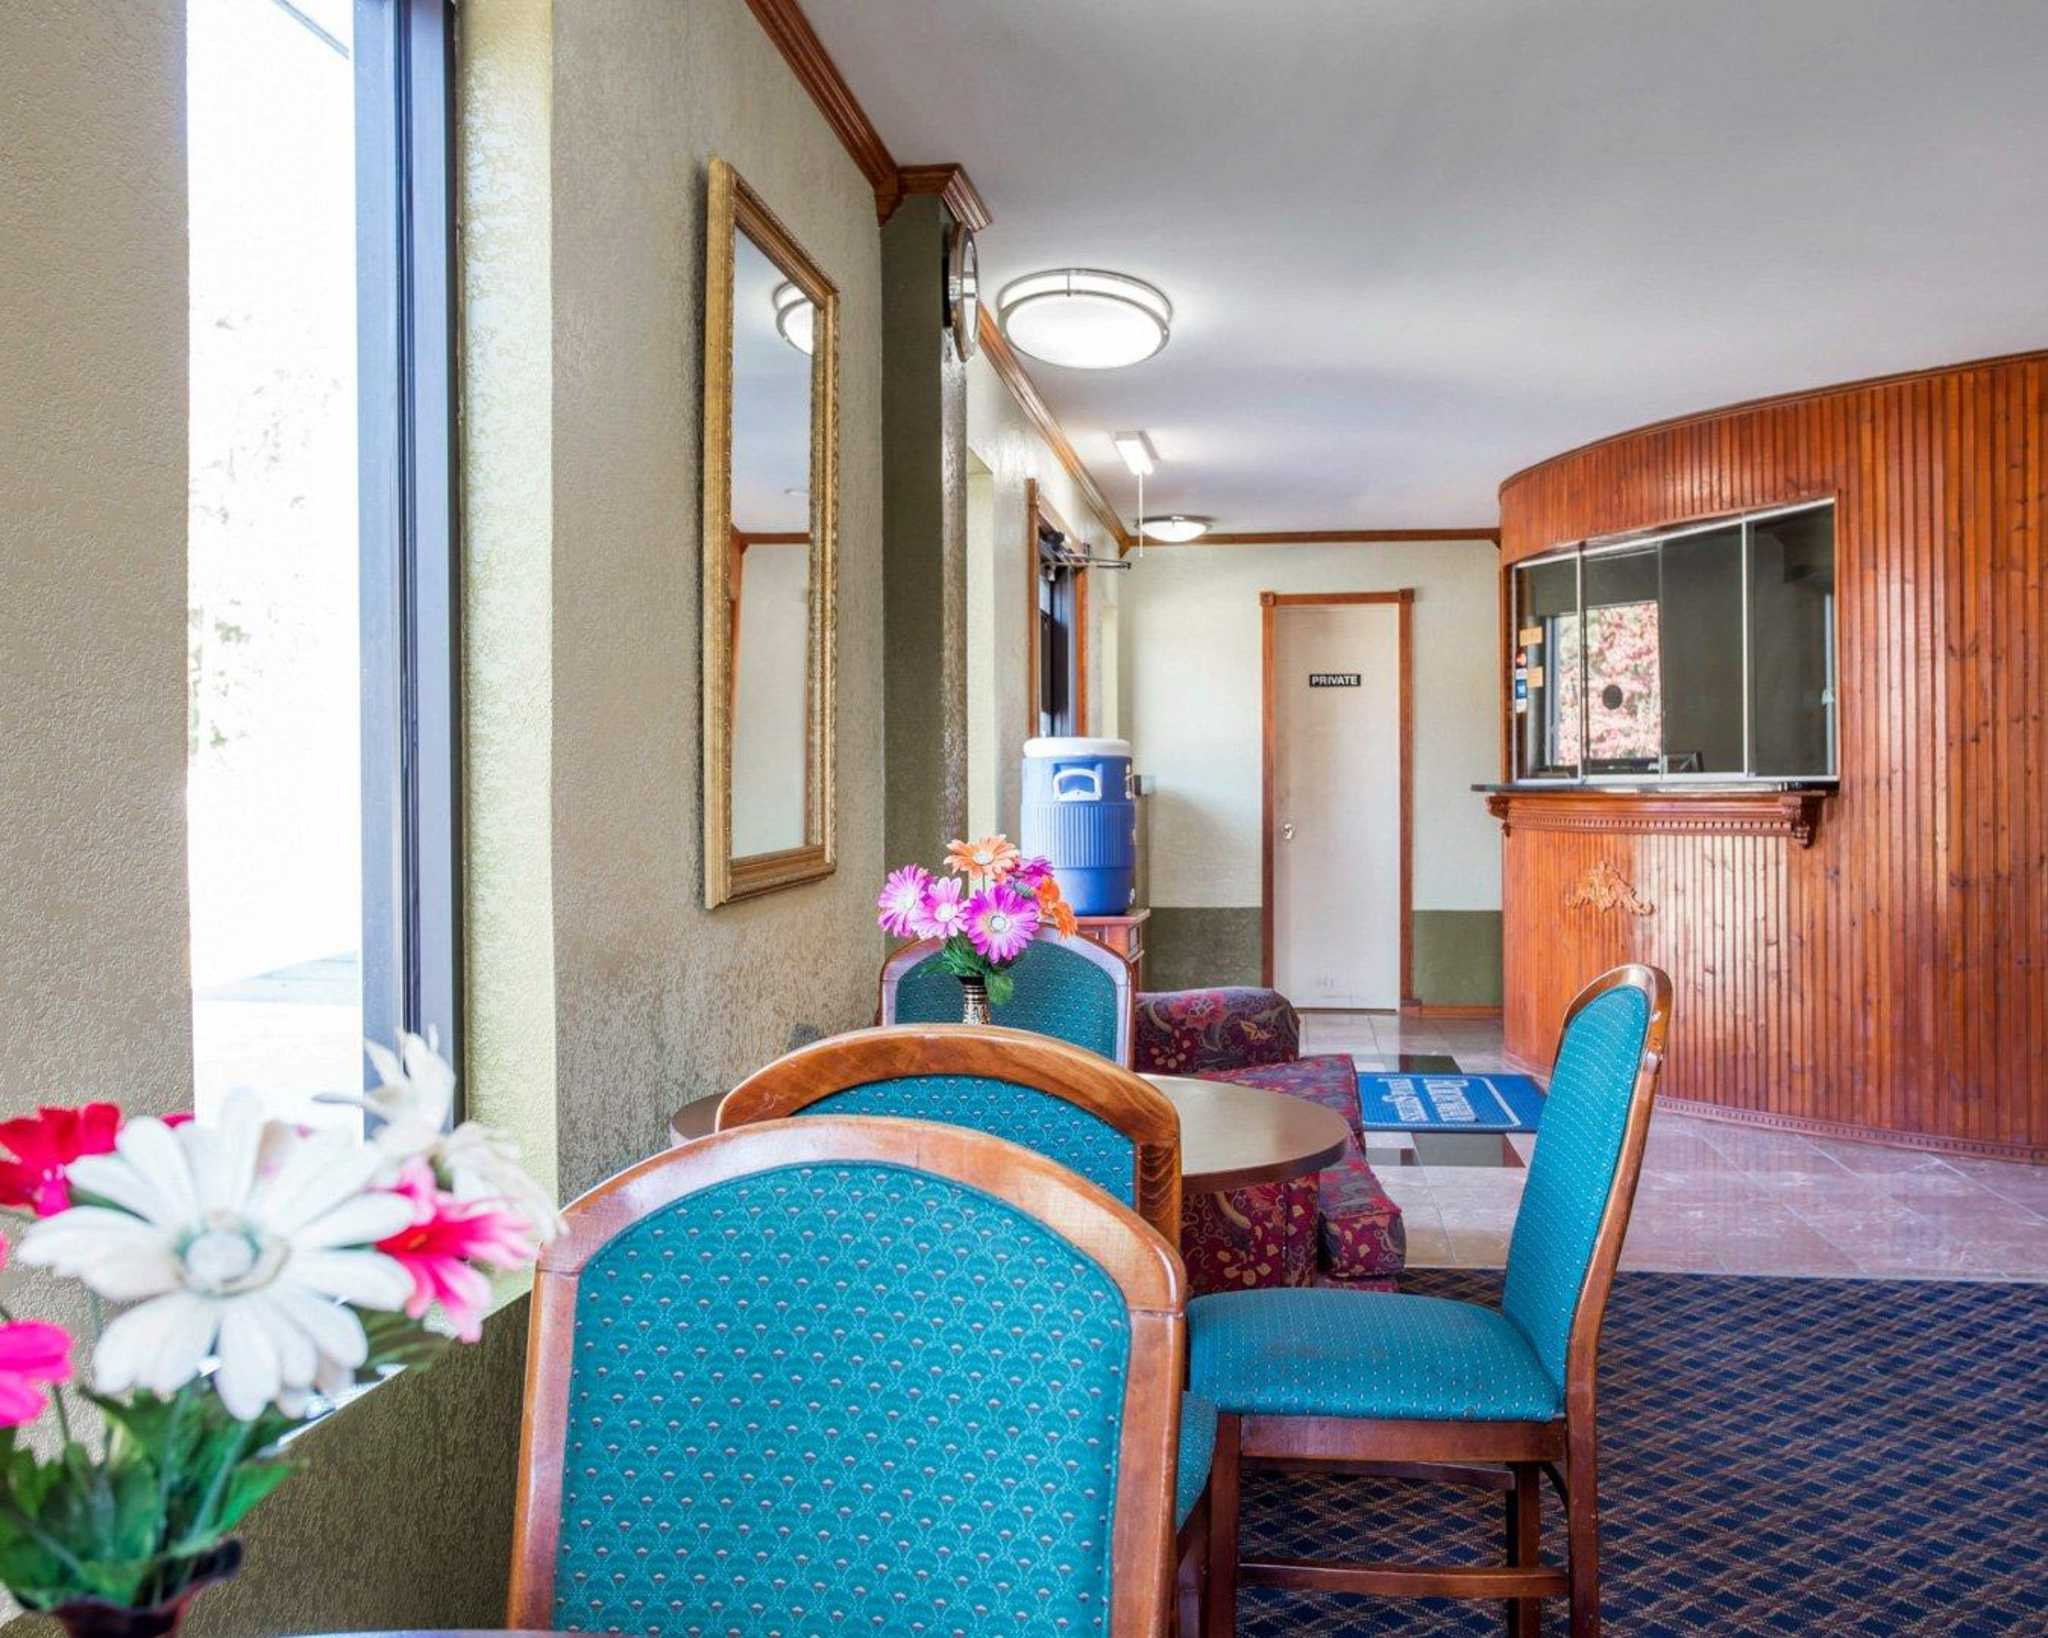 Rodeway Inn & Suites Fort Jackson image 21